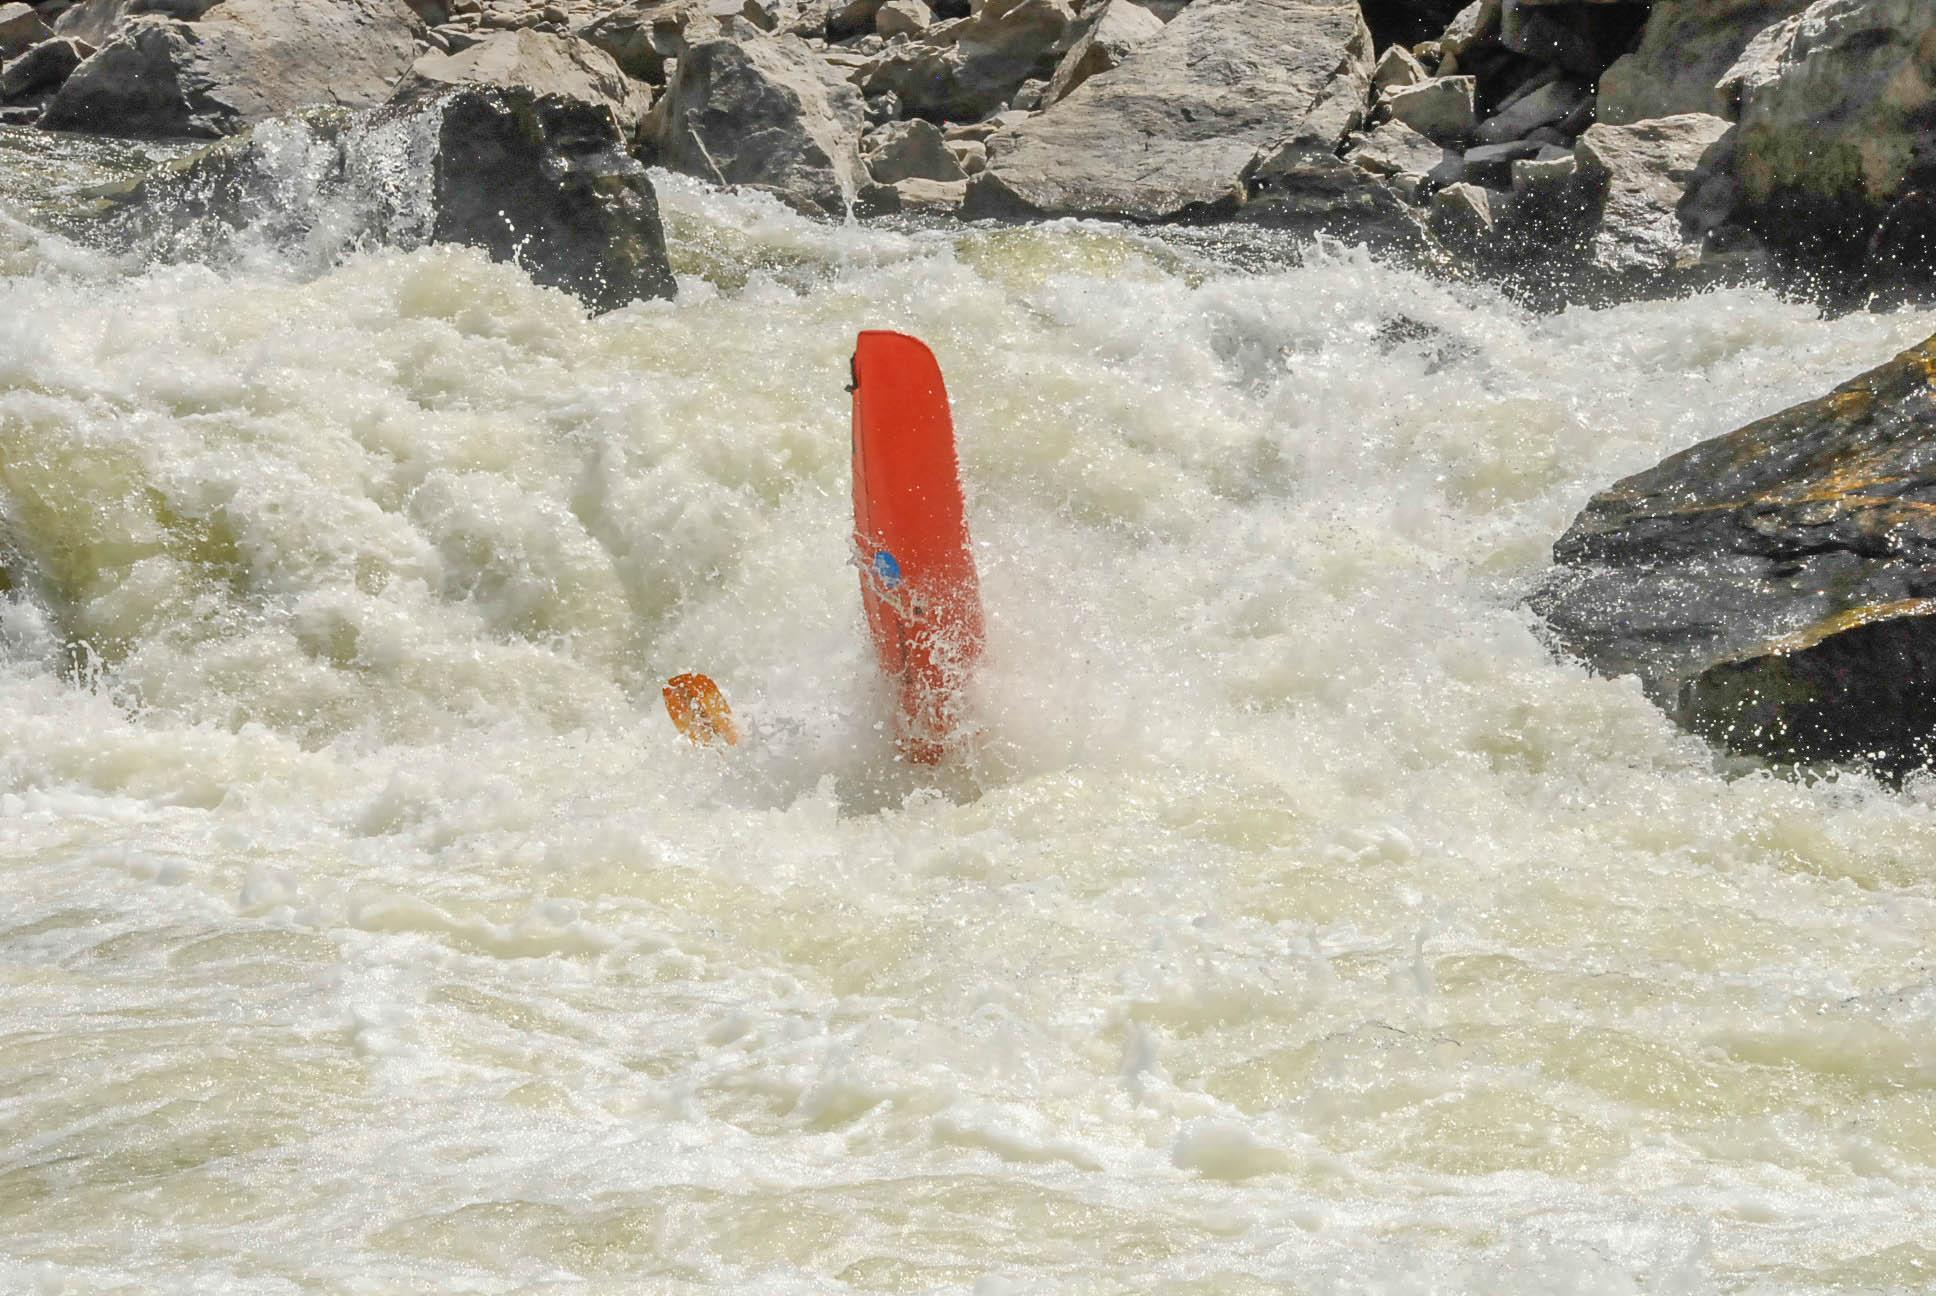 Click image for larger version  Name:kayak (366).jpg Views:131 Size:383.9 KB ID:11752